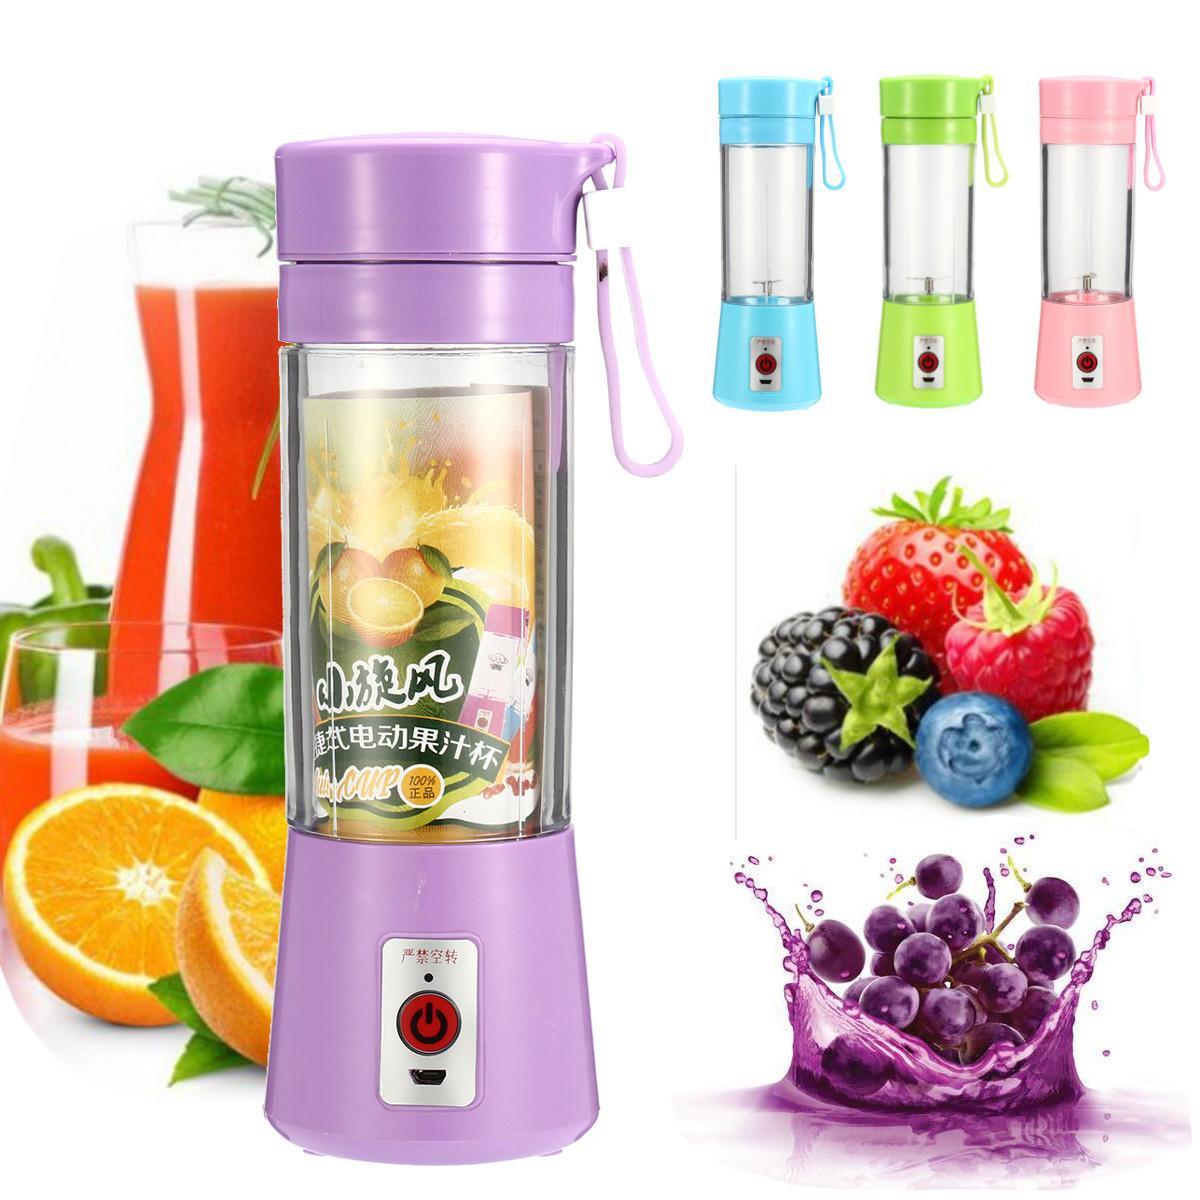 380ml Portable Electric Juice Blender Bottle Safety Juicer Cup Multi-functional